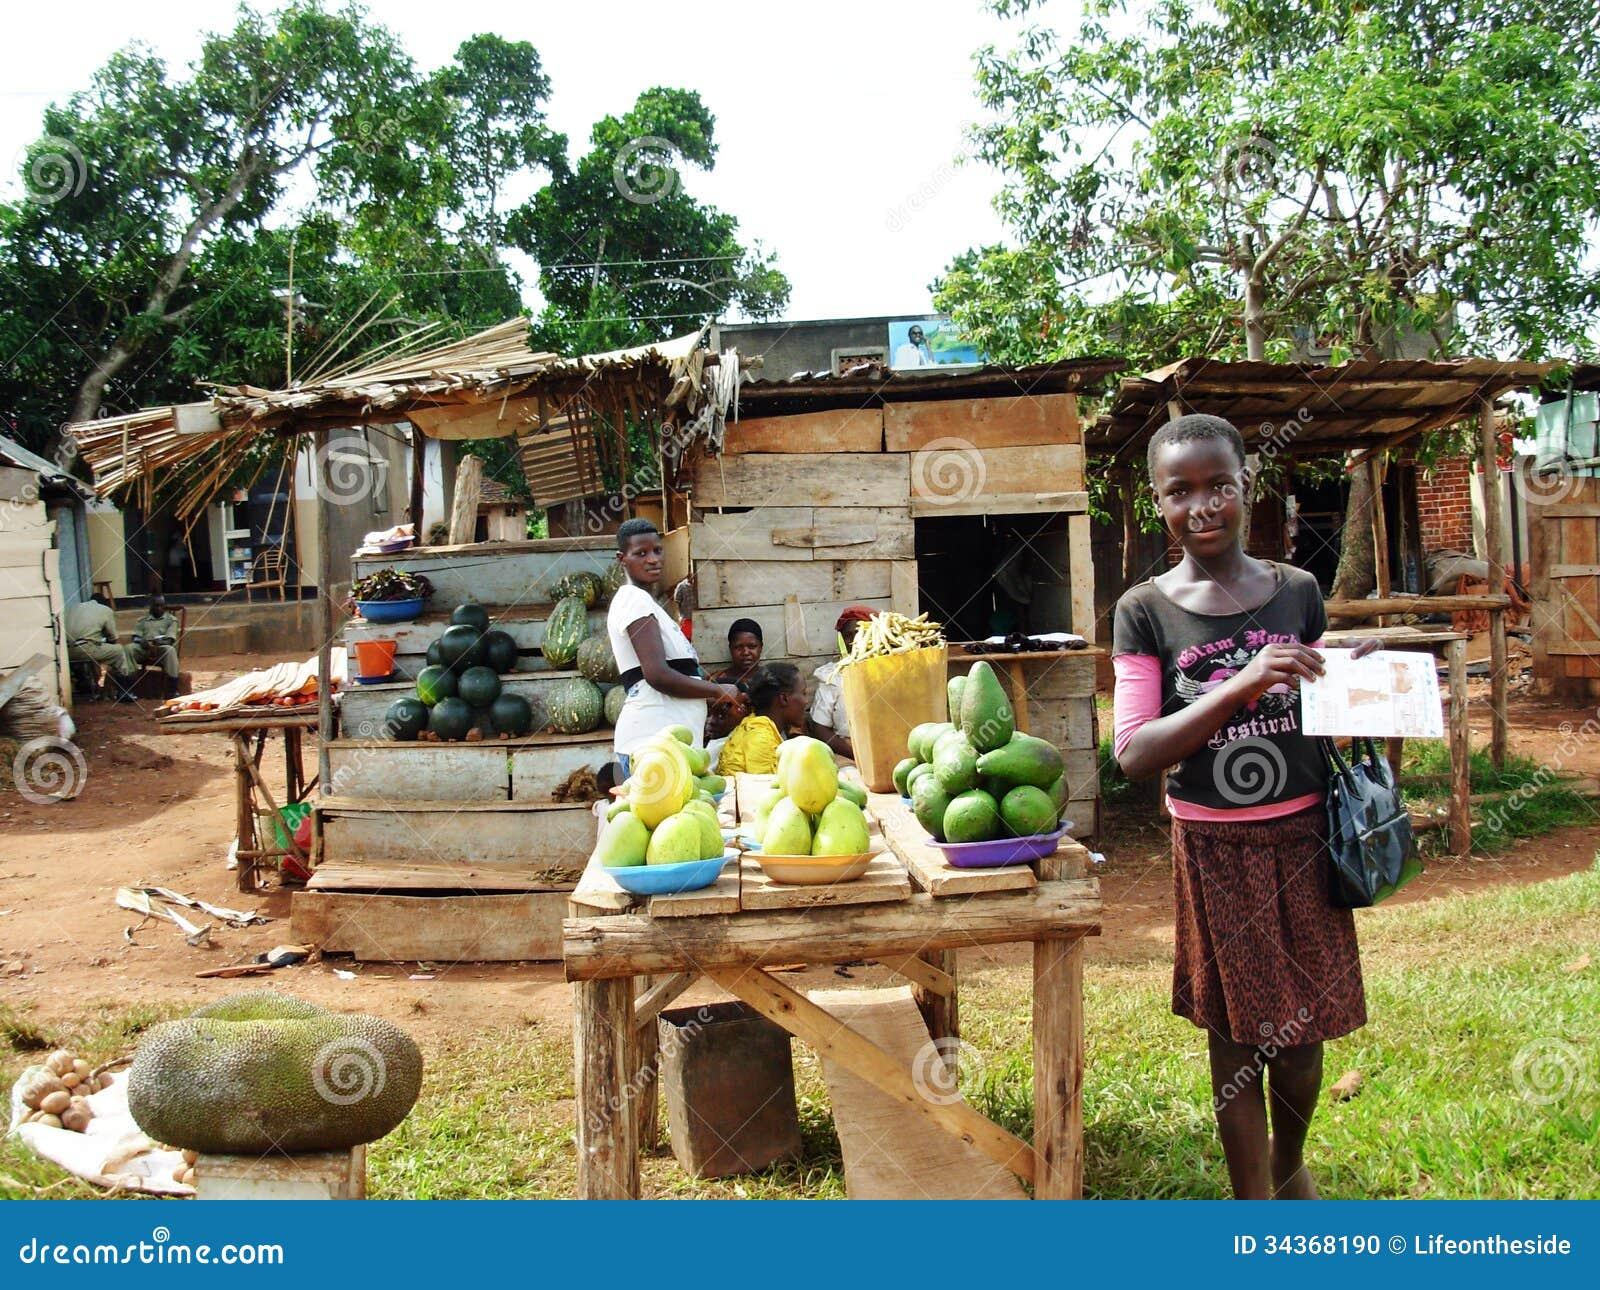 Ugandan Women Selling Local Fruit On Road Side Editorial Image - Image 34368190-5773